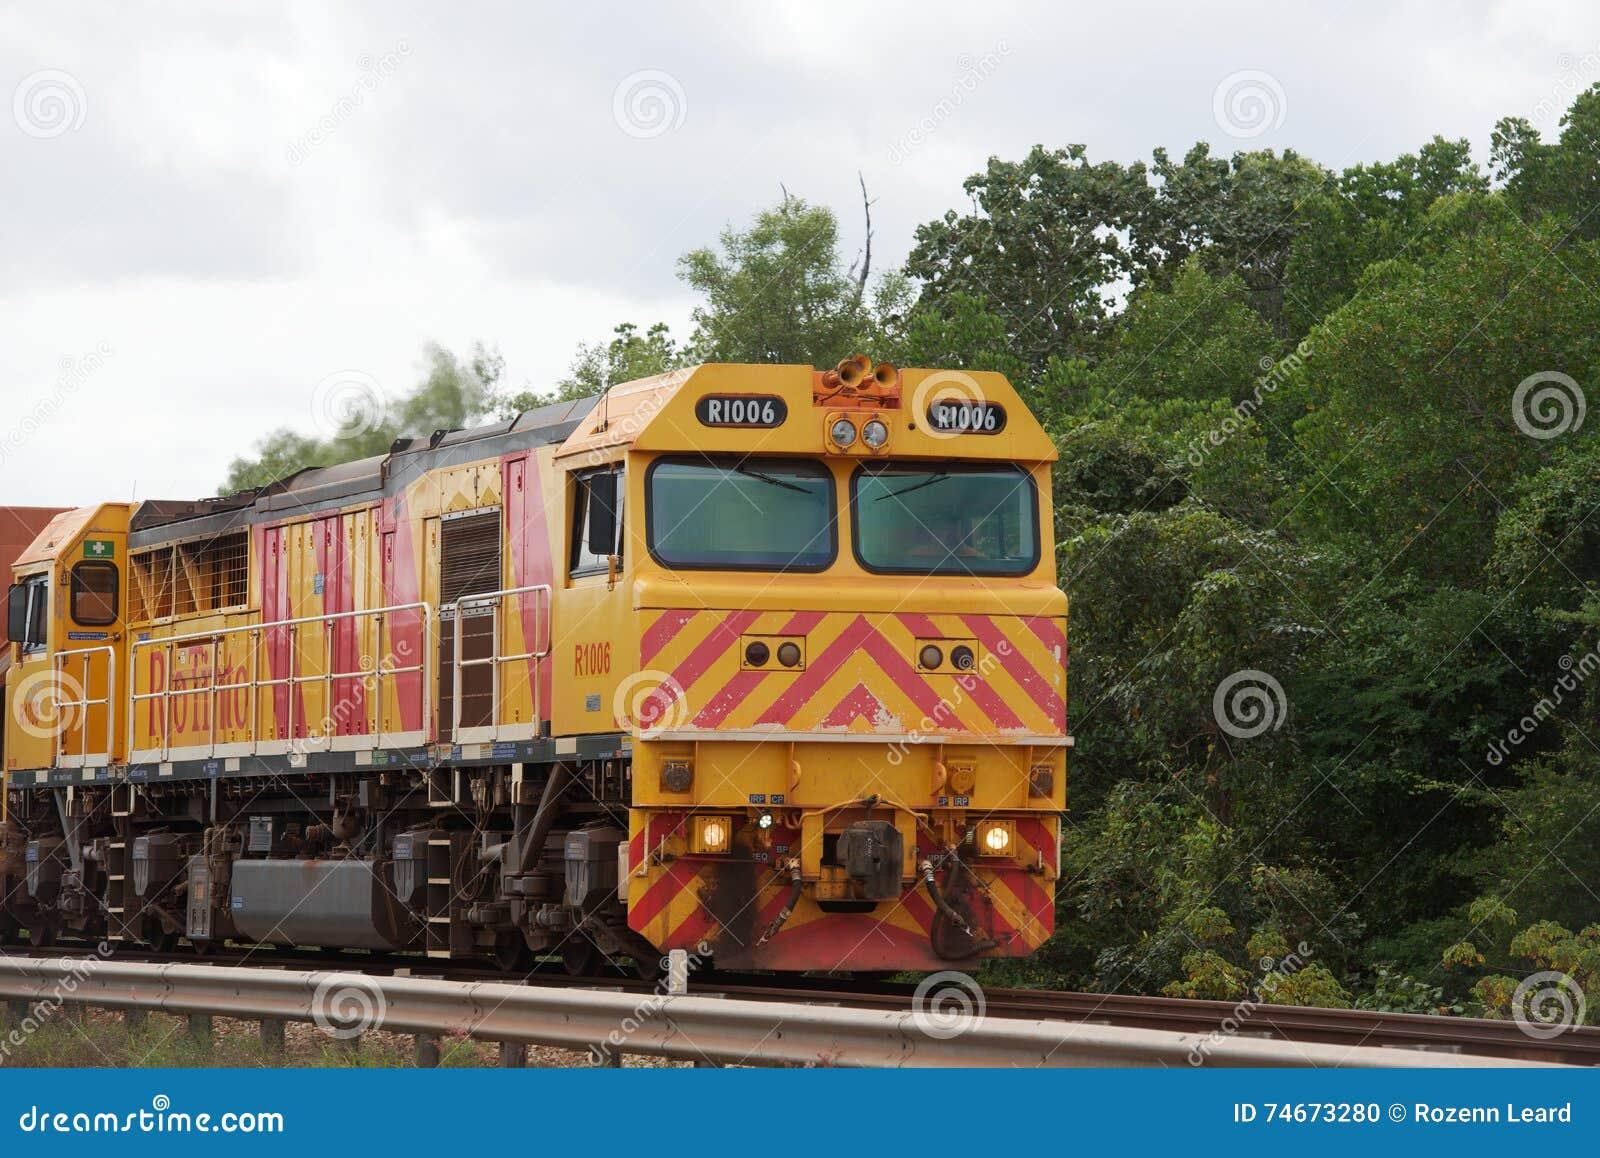 Rio Tinto Train editorial image  Image of transport, jobs